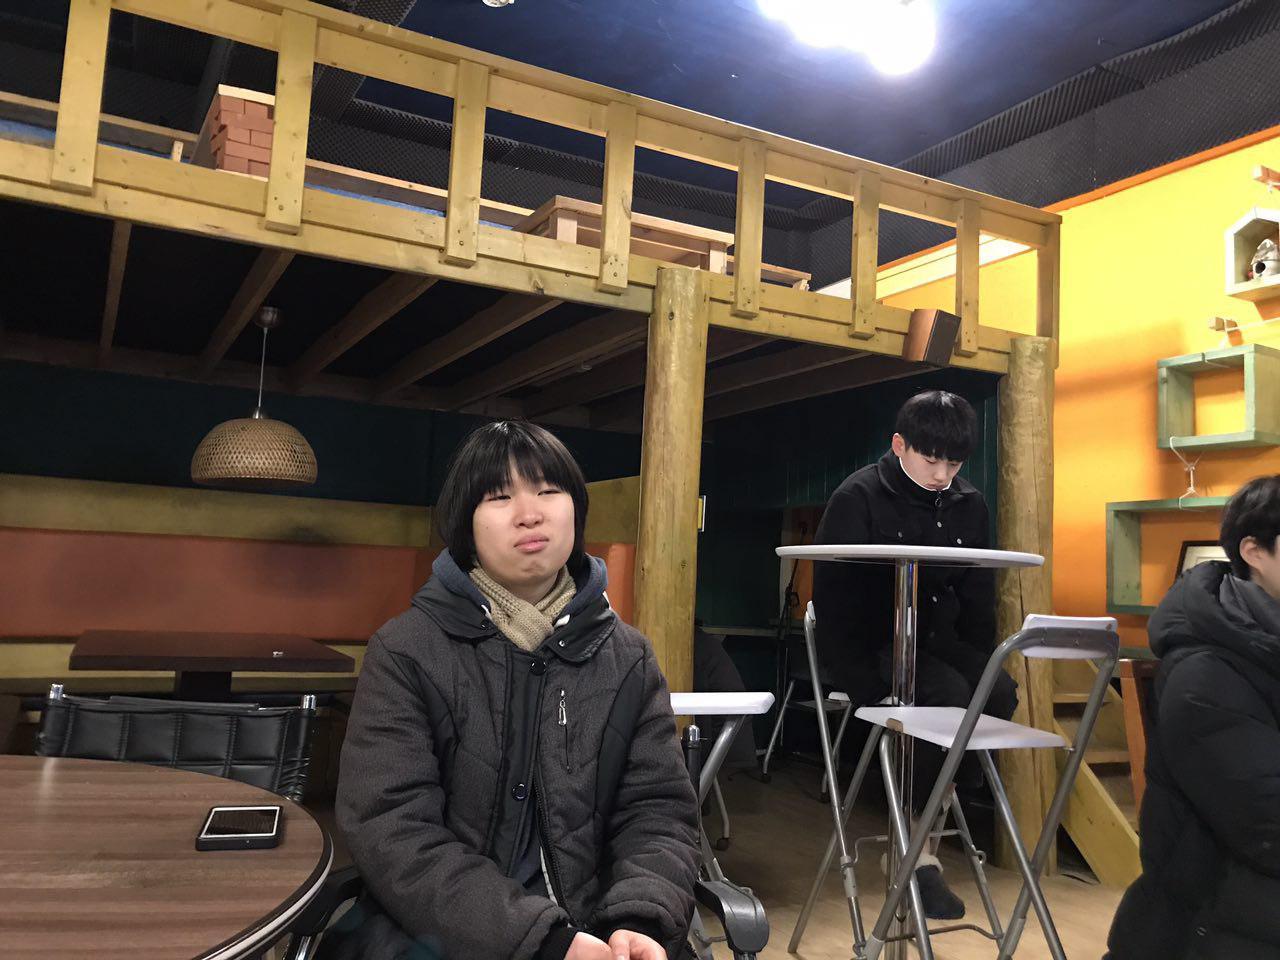 photo_2018-02-14_18-02-57.jpg